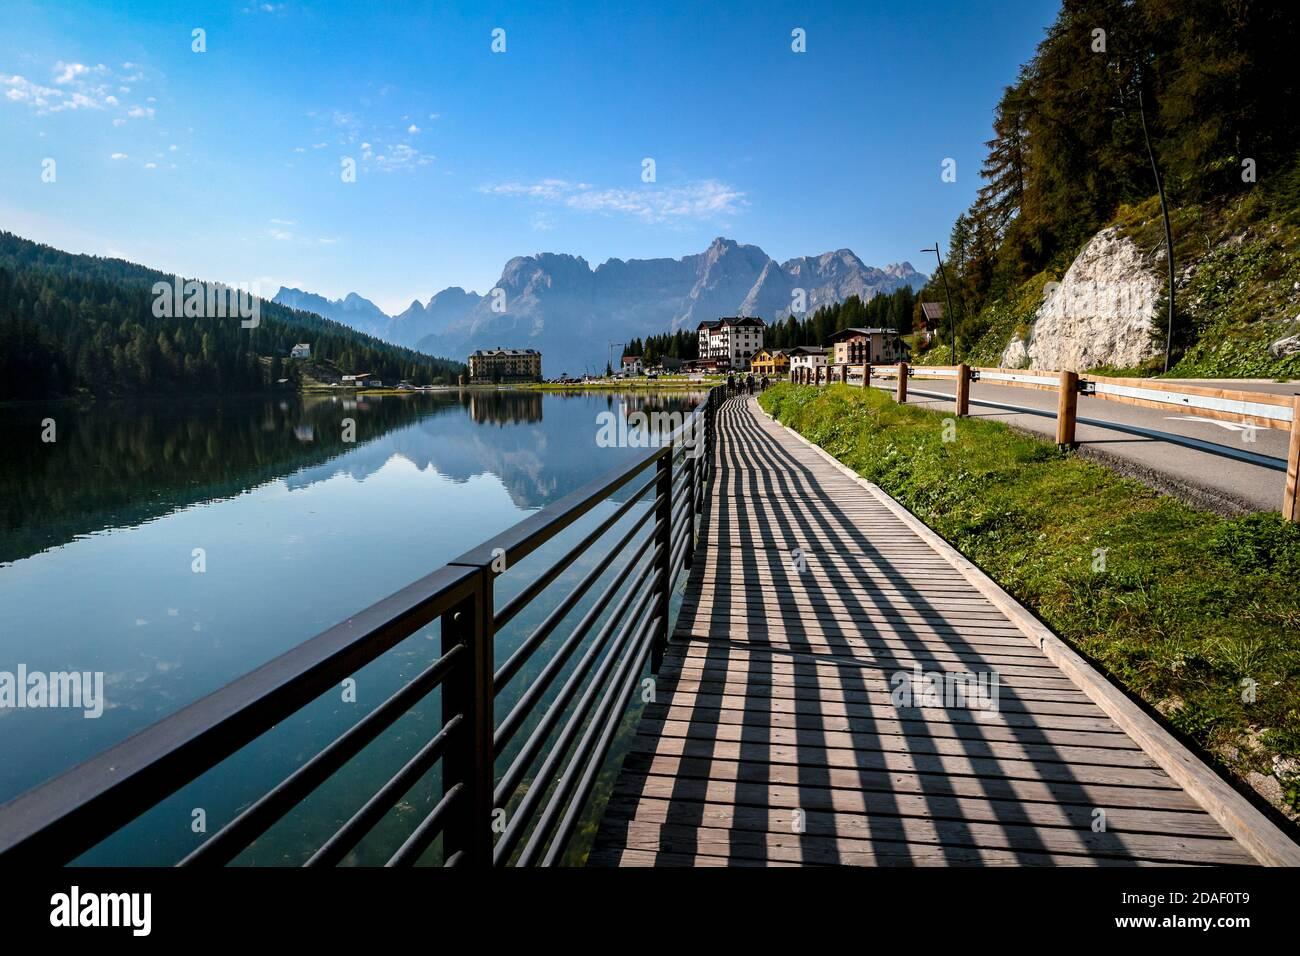 Lago di Misurina and hard lines of shadows with mirror lake reflections of the alpine mountain panorama of the Dolomites in Misurina, Veneto, Italy. Stock Photo